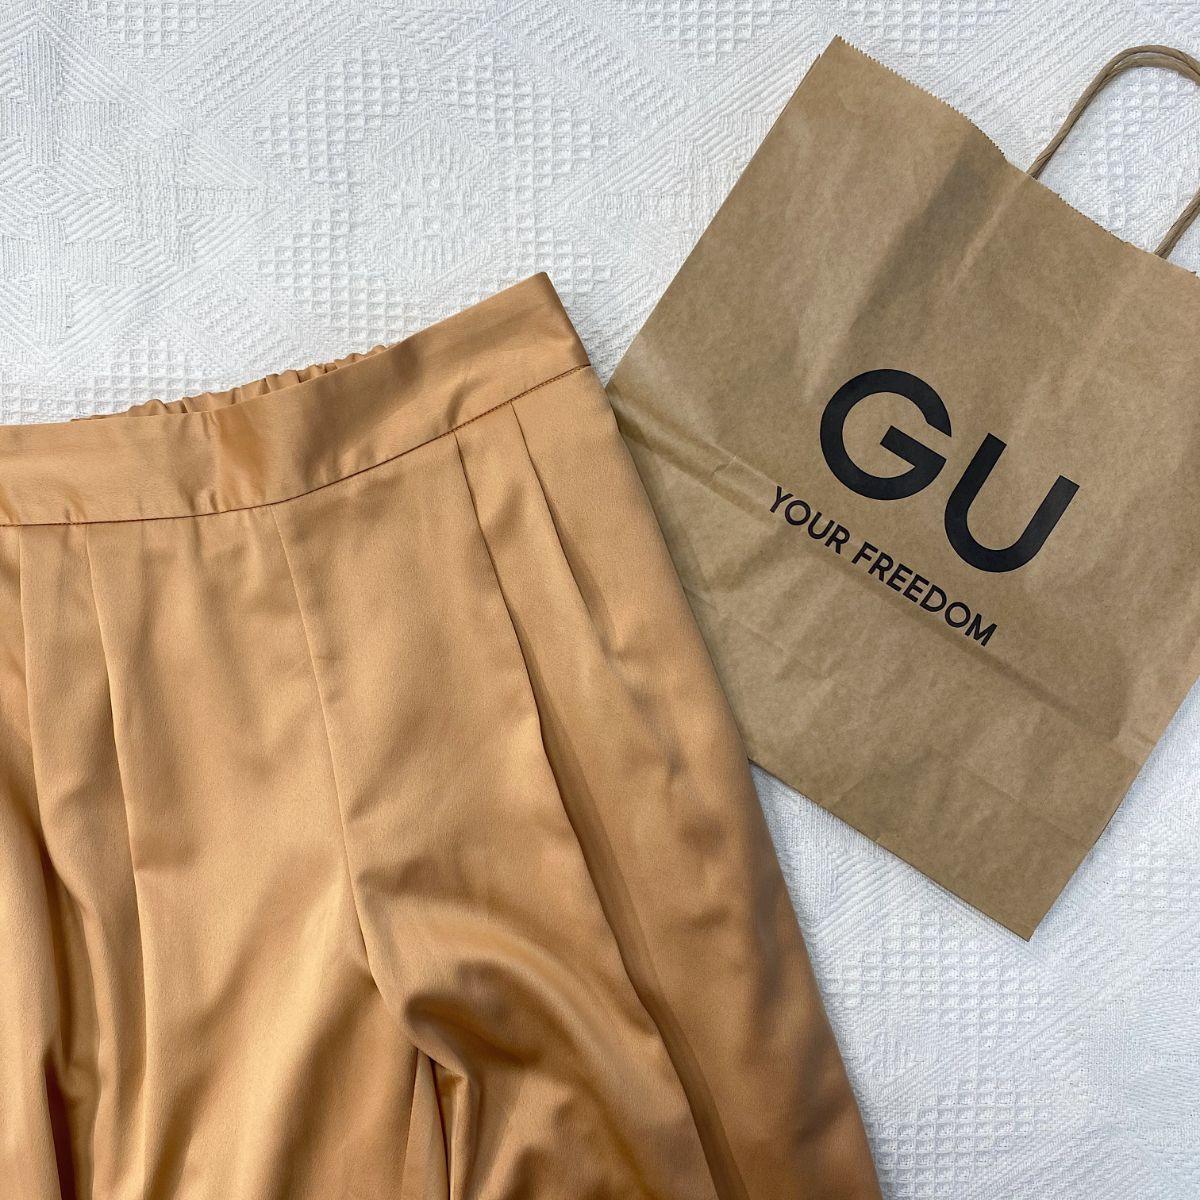 "【GUレポ】おうち時間が長い今、パンツは""ラクさ""が最重要。家でも外でも穿けるプチプラボトムスはこれ"